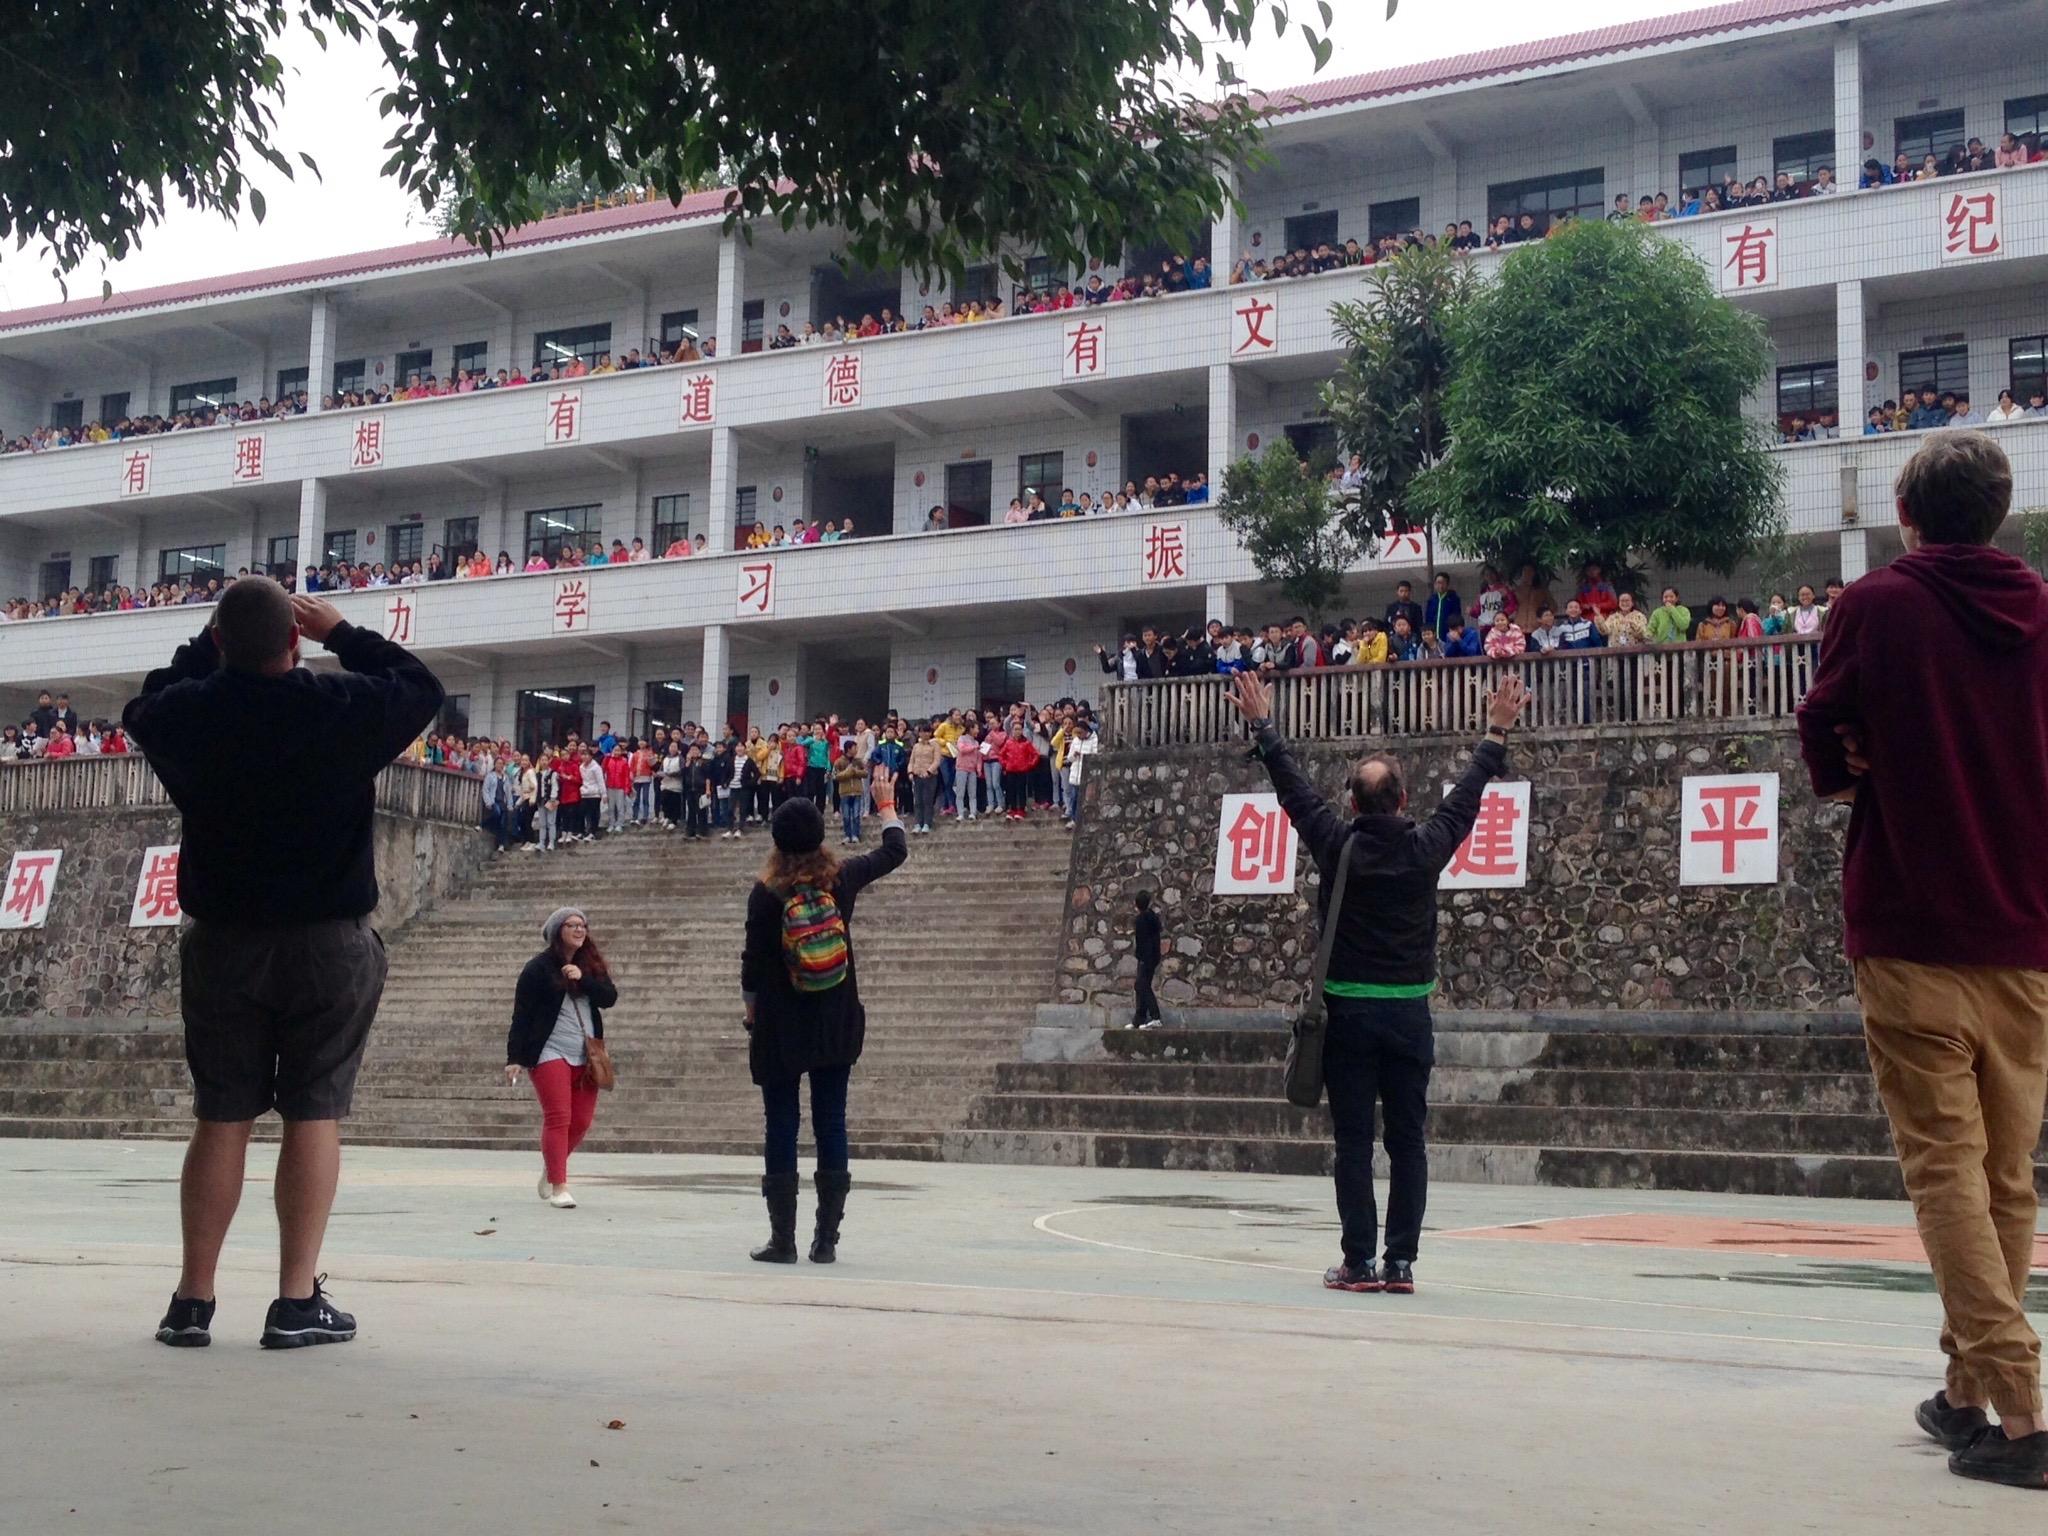 School_in_China.JPG